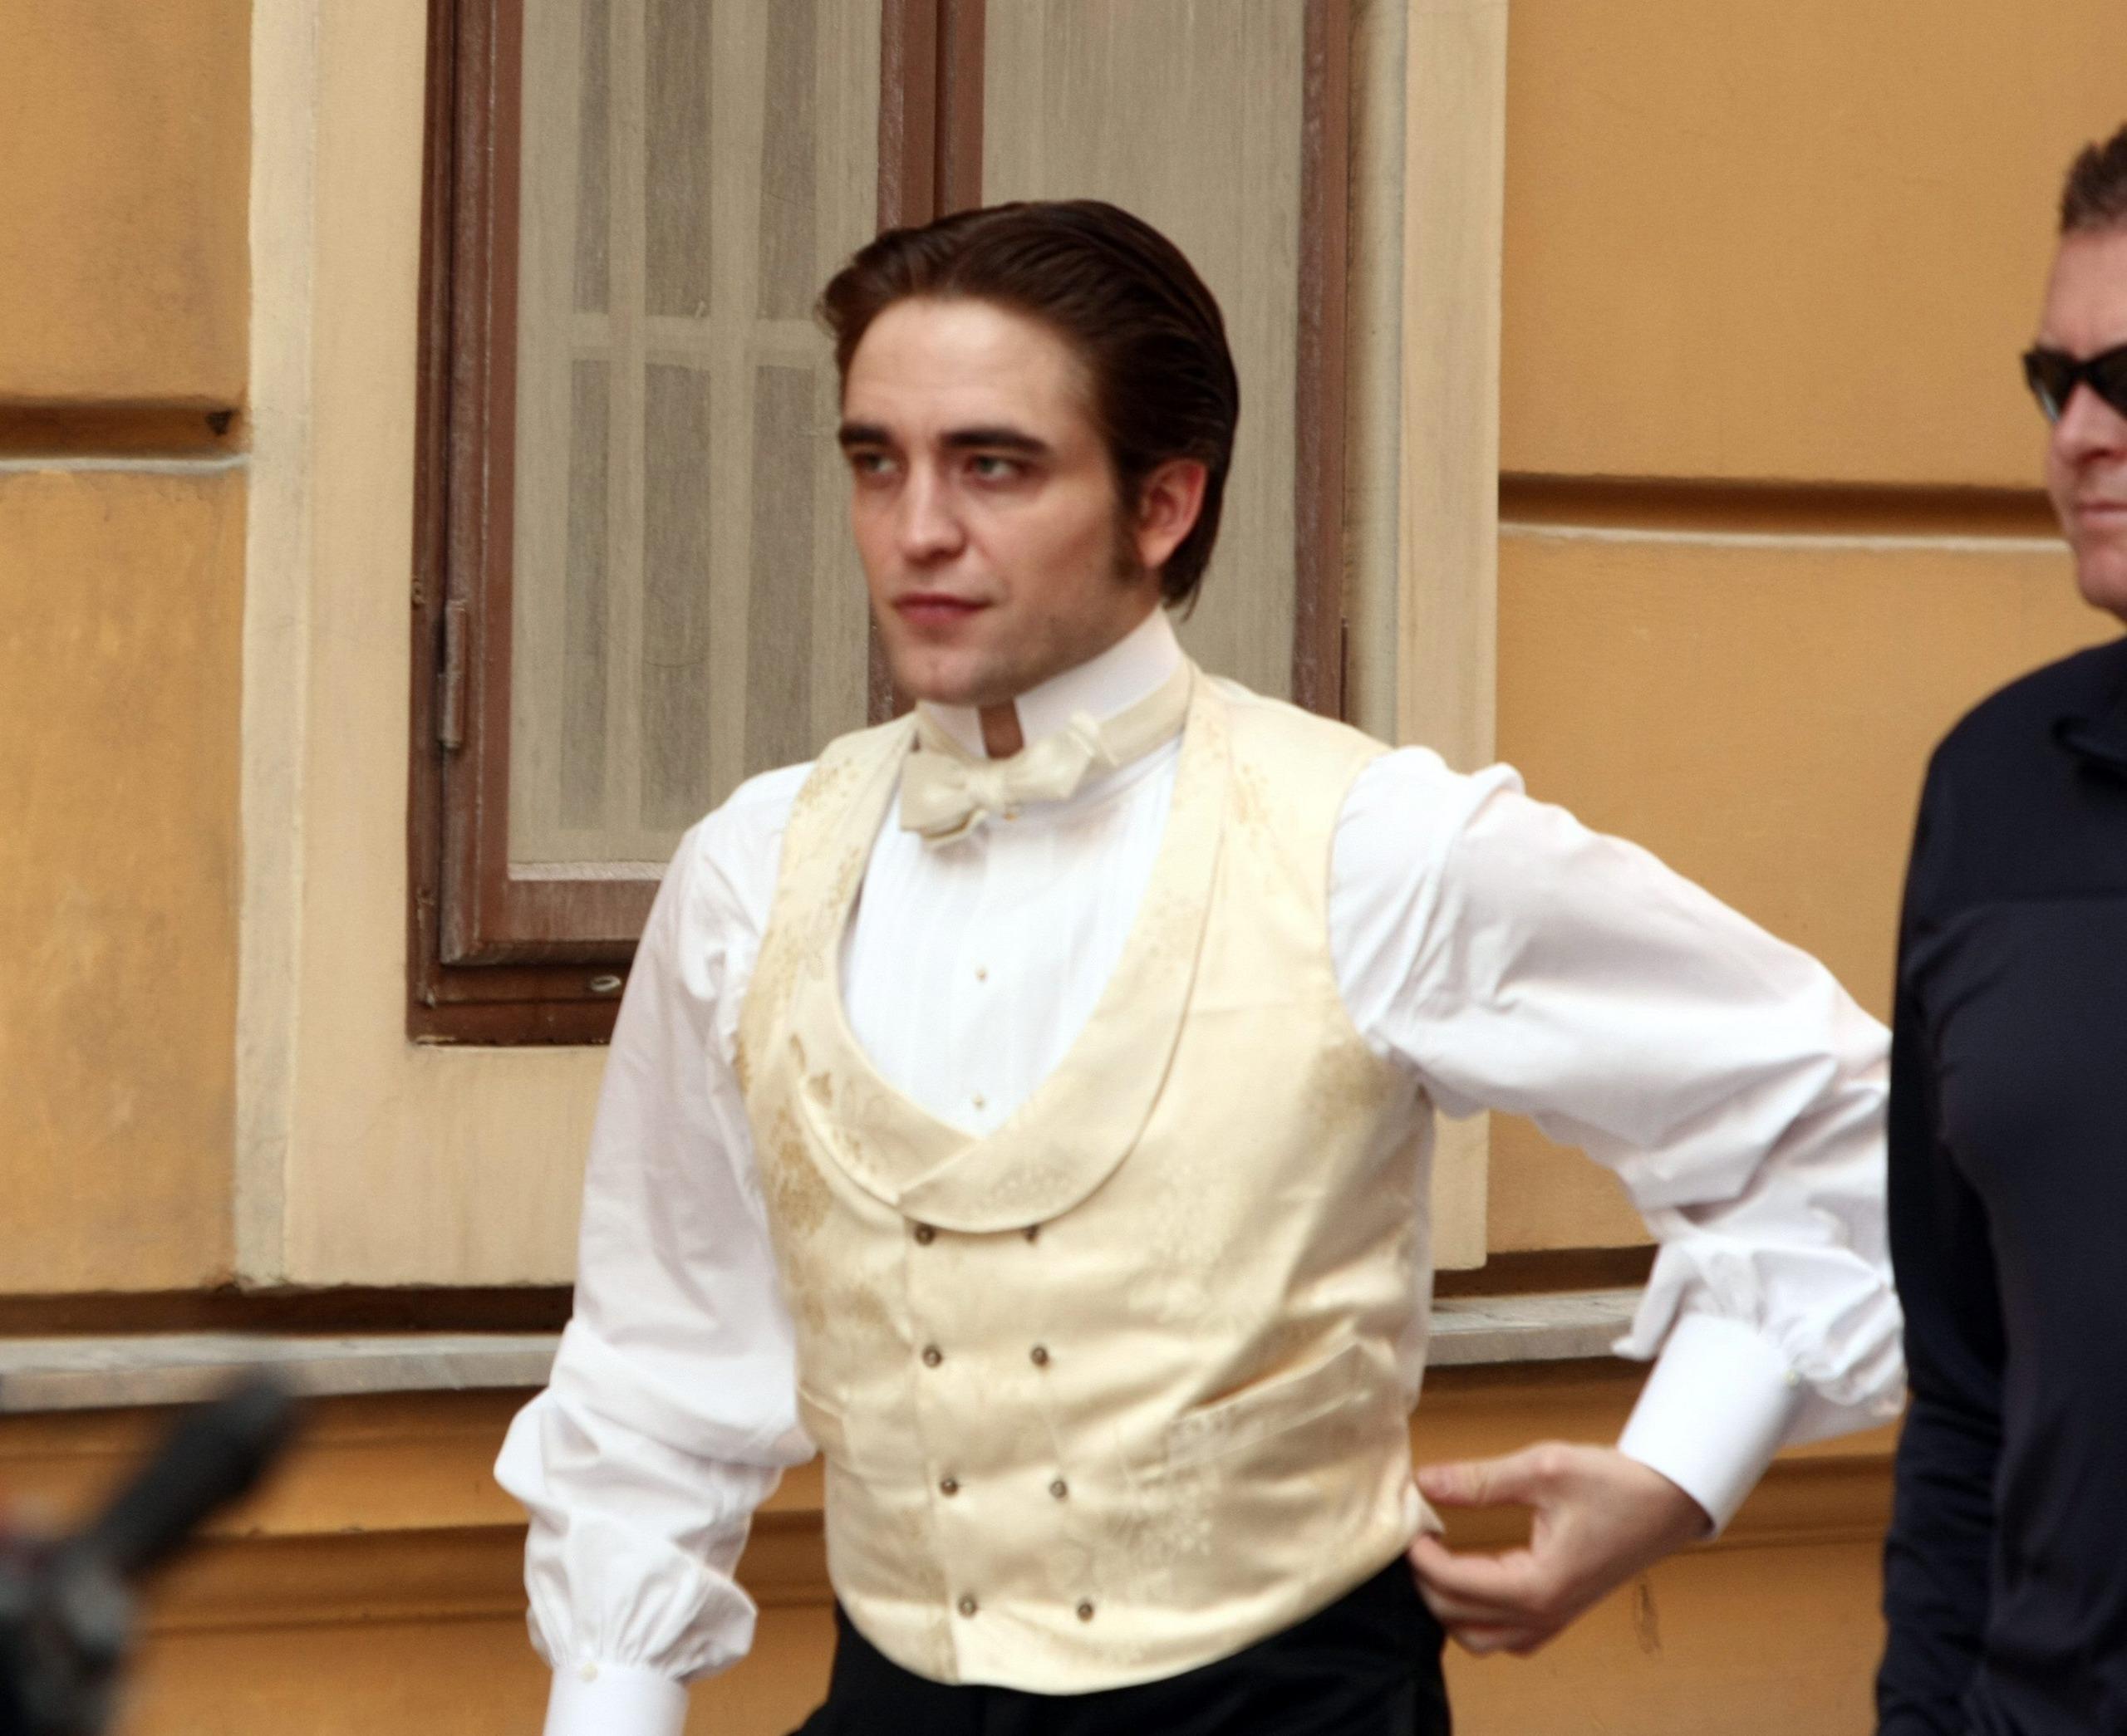 Robert on the set of Bel Ami 4/8/10